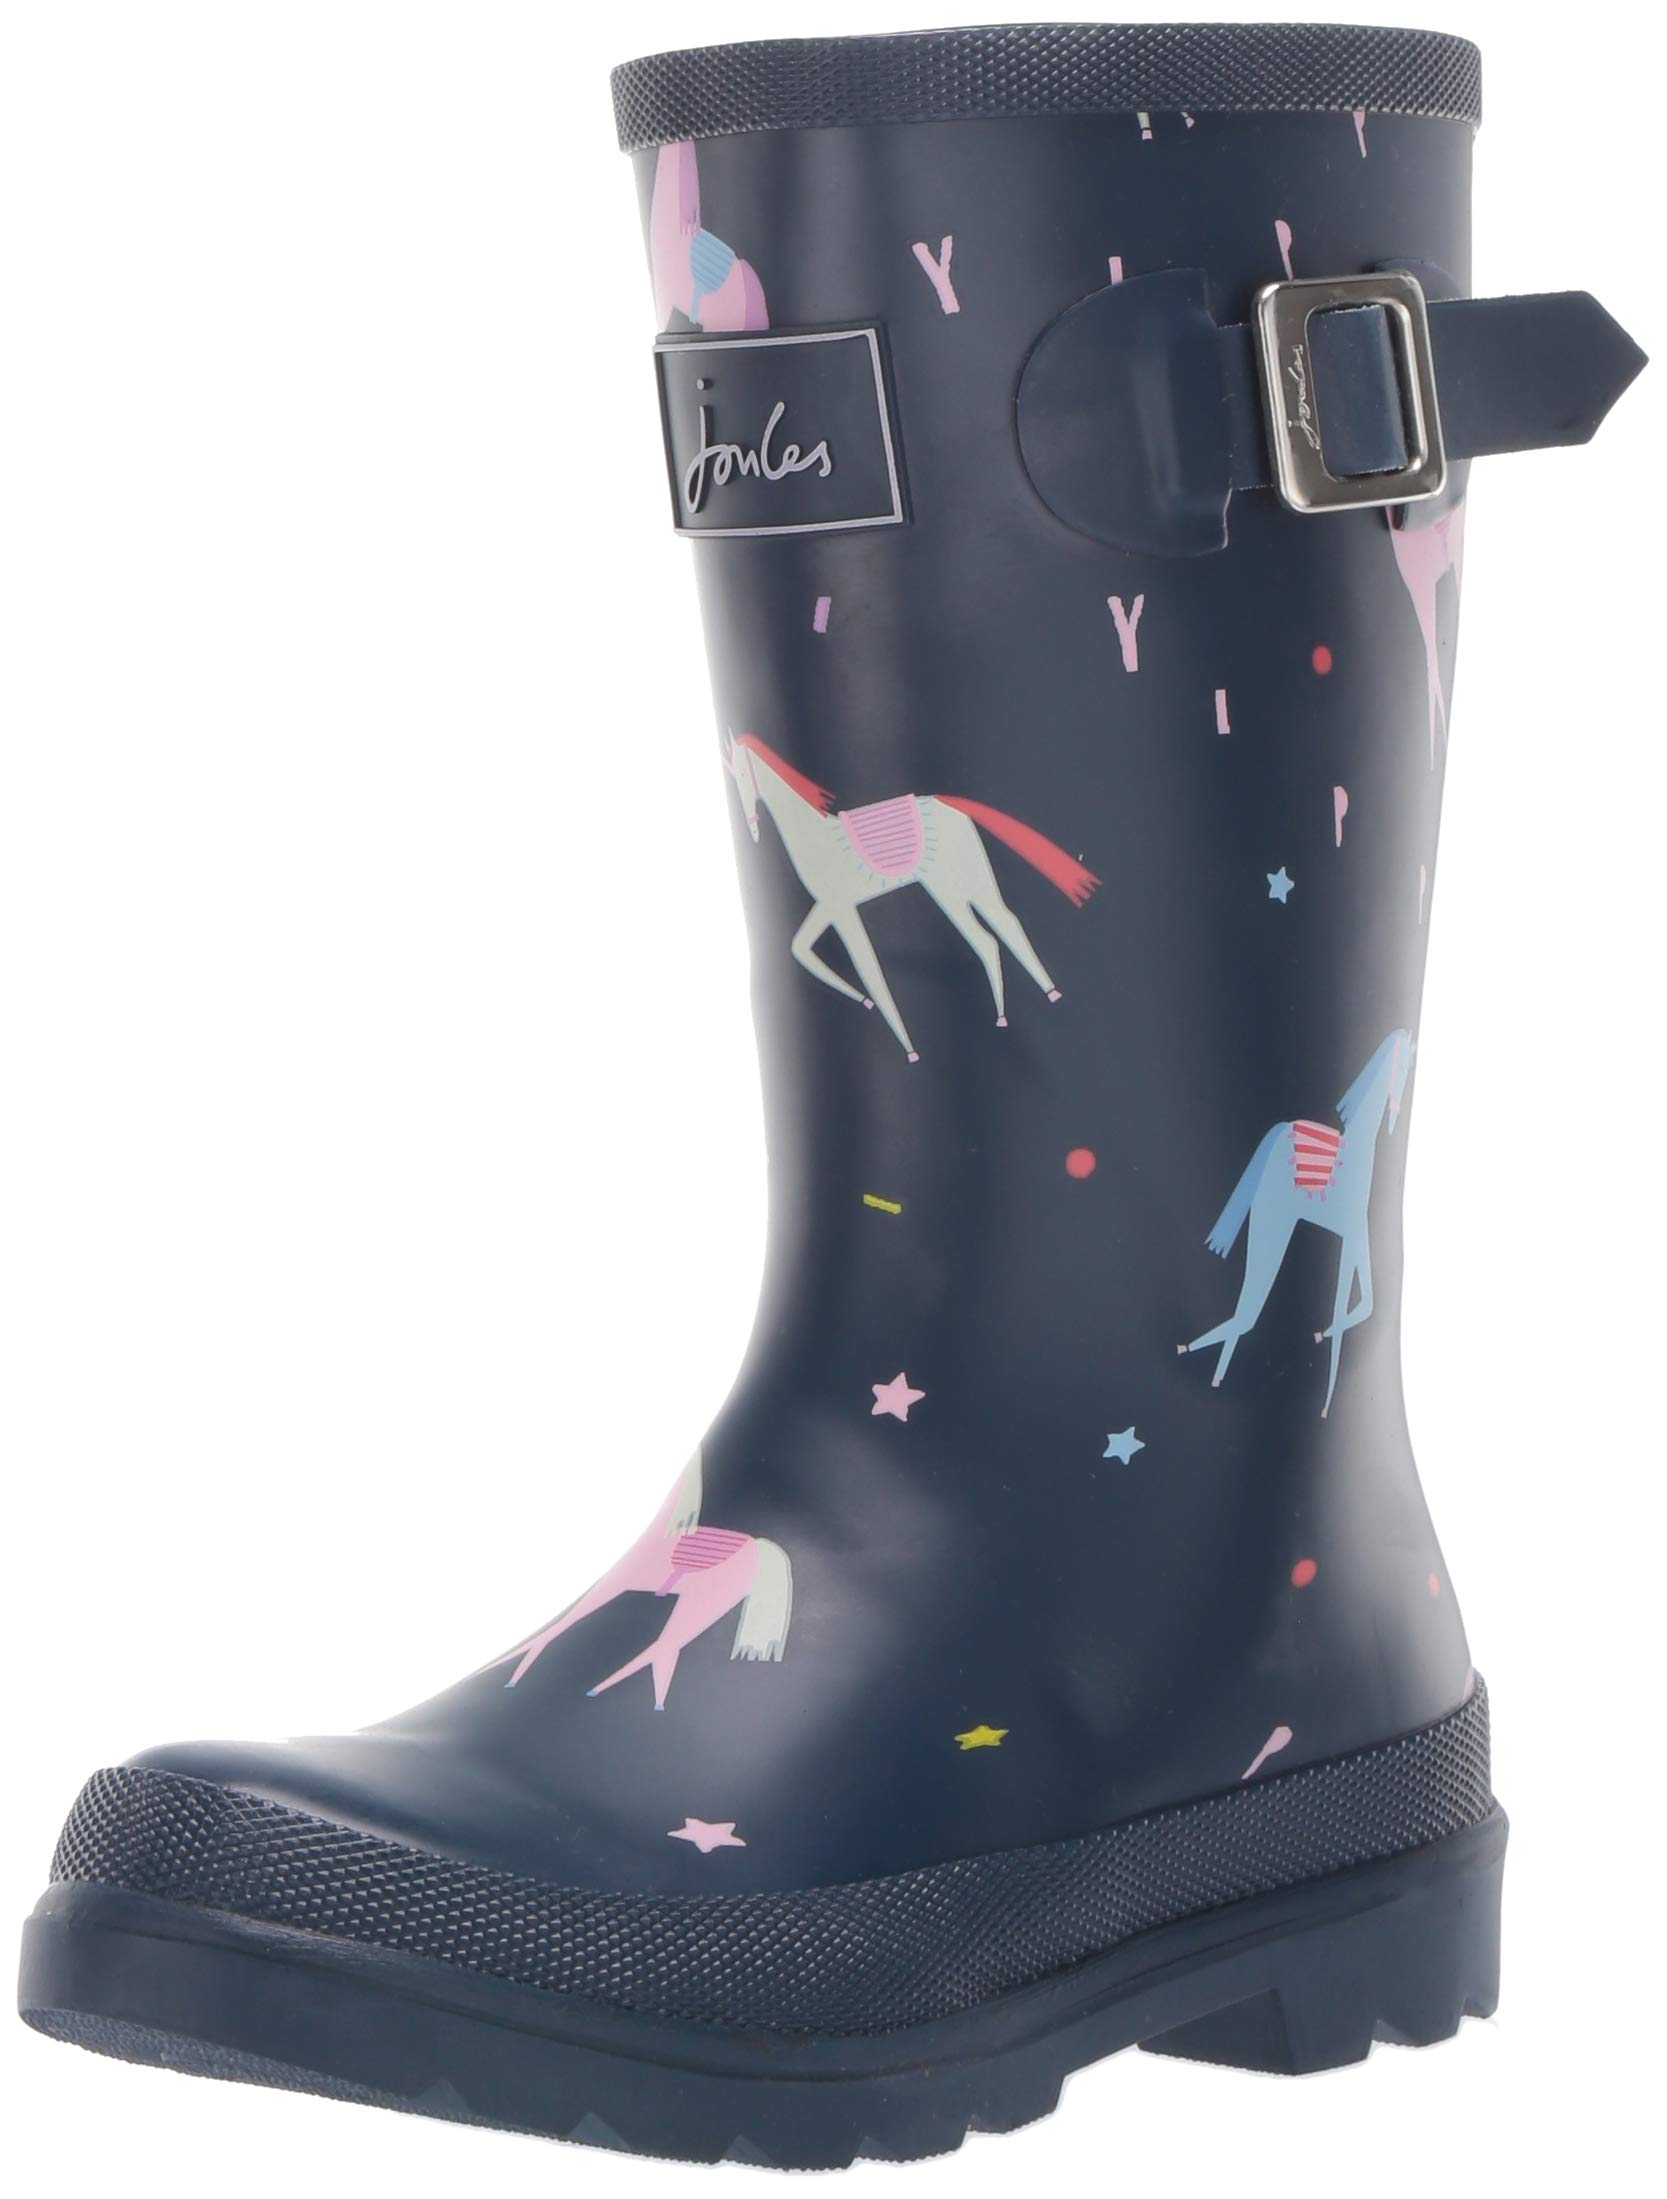 Joules Girls' JNR Welly Print Rain Boot, Blue Unicorn, 3 M US Little Kid